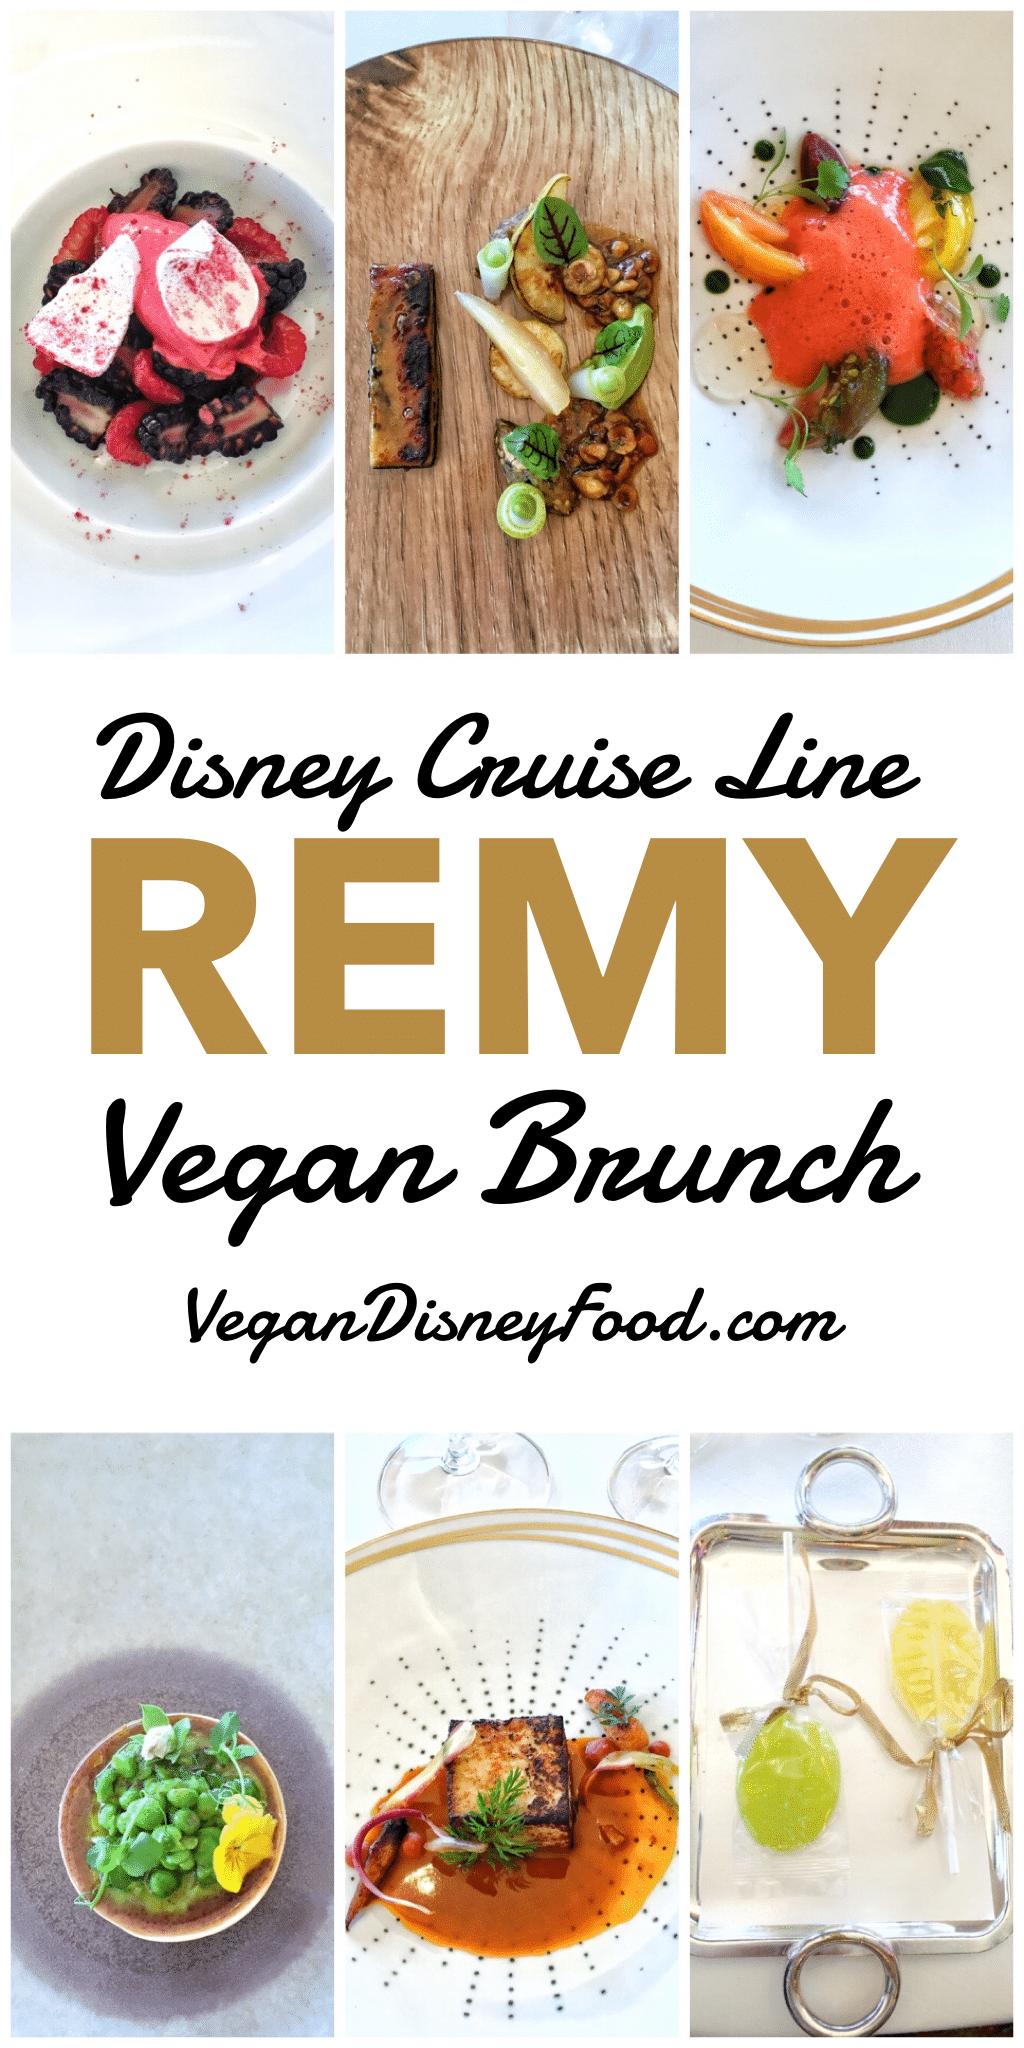 Disney Cruise Line Remy Champagne Brunch Vegan Menu Options